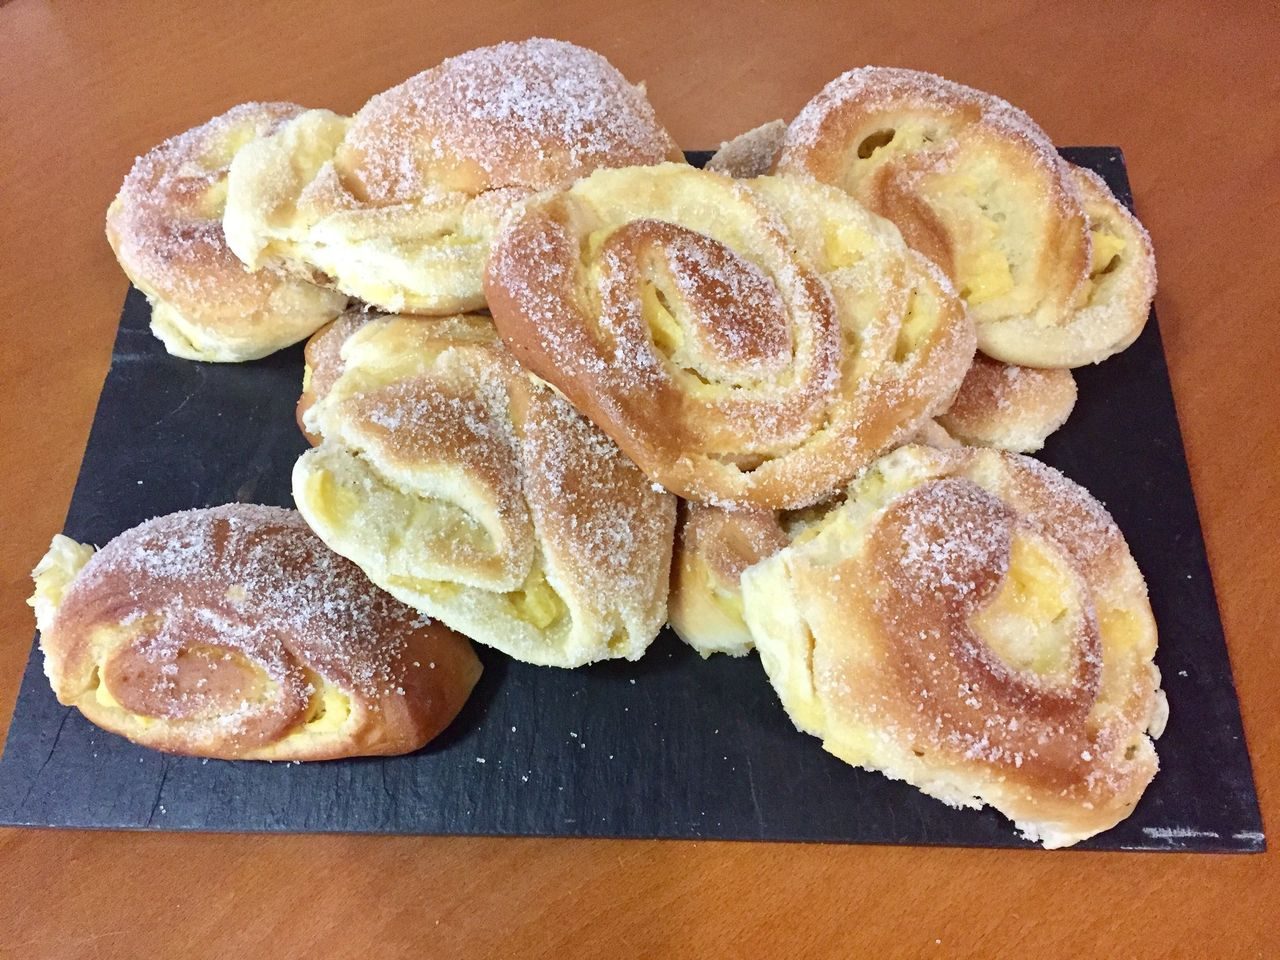 Coques de Montblanc del Forn de pa Joan | Cedida